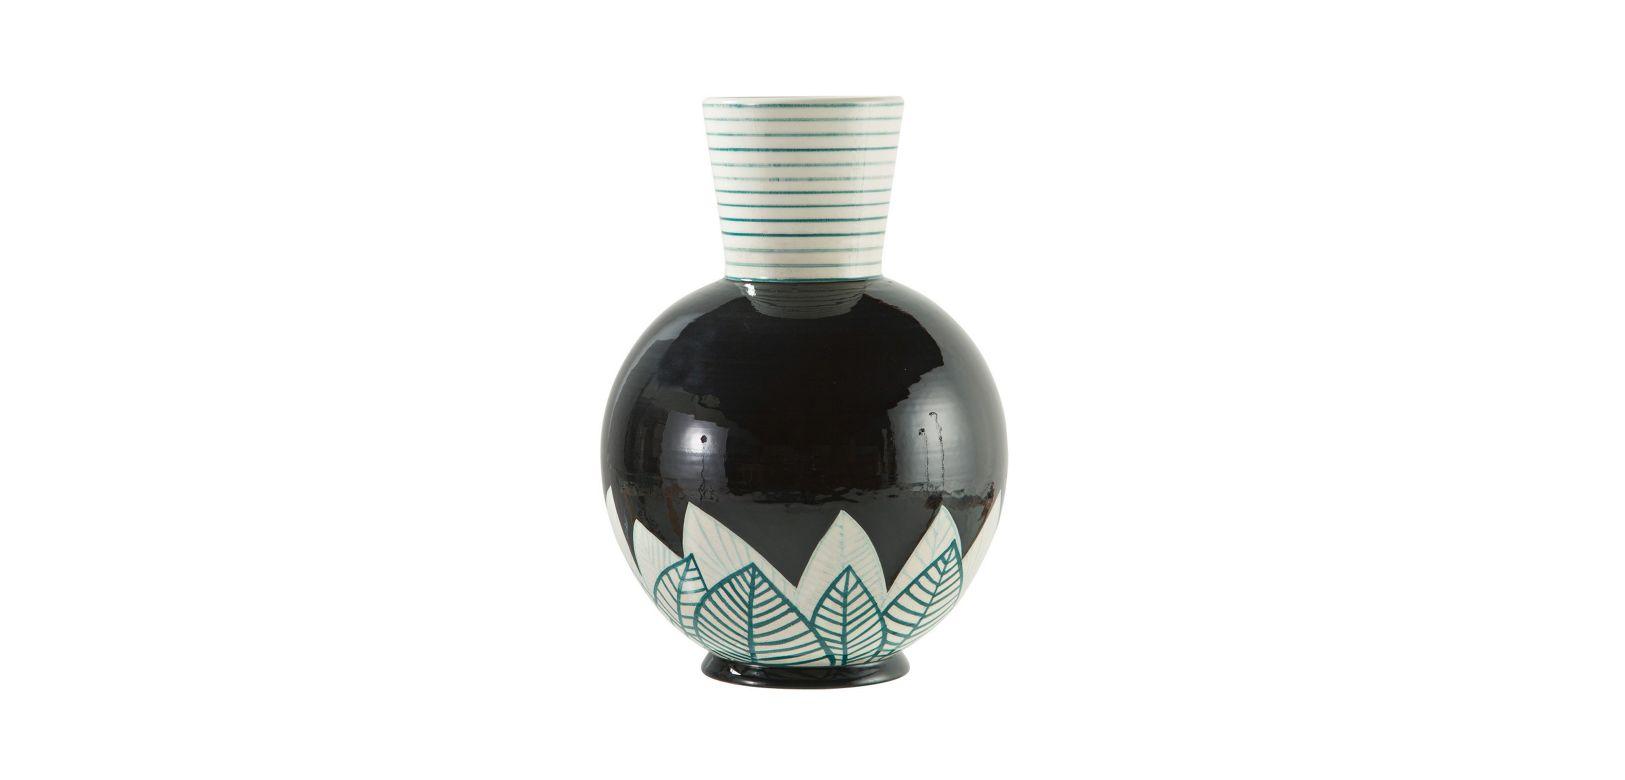 Canope Vase Roche Bobois